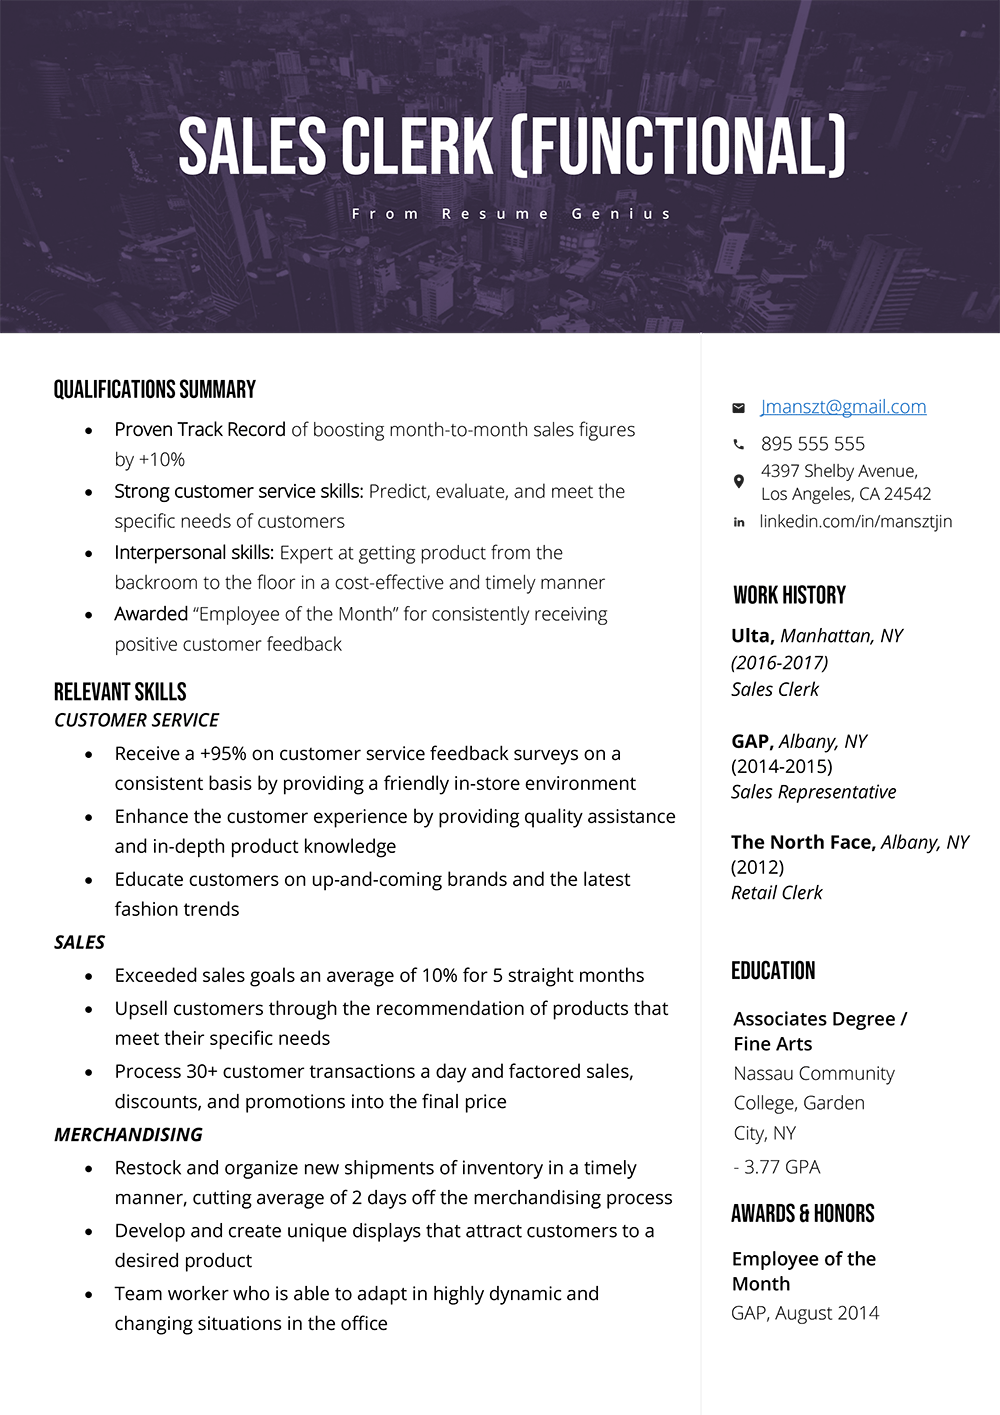 transferable skills resume templates Resume Template